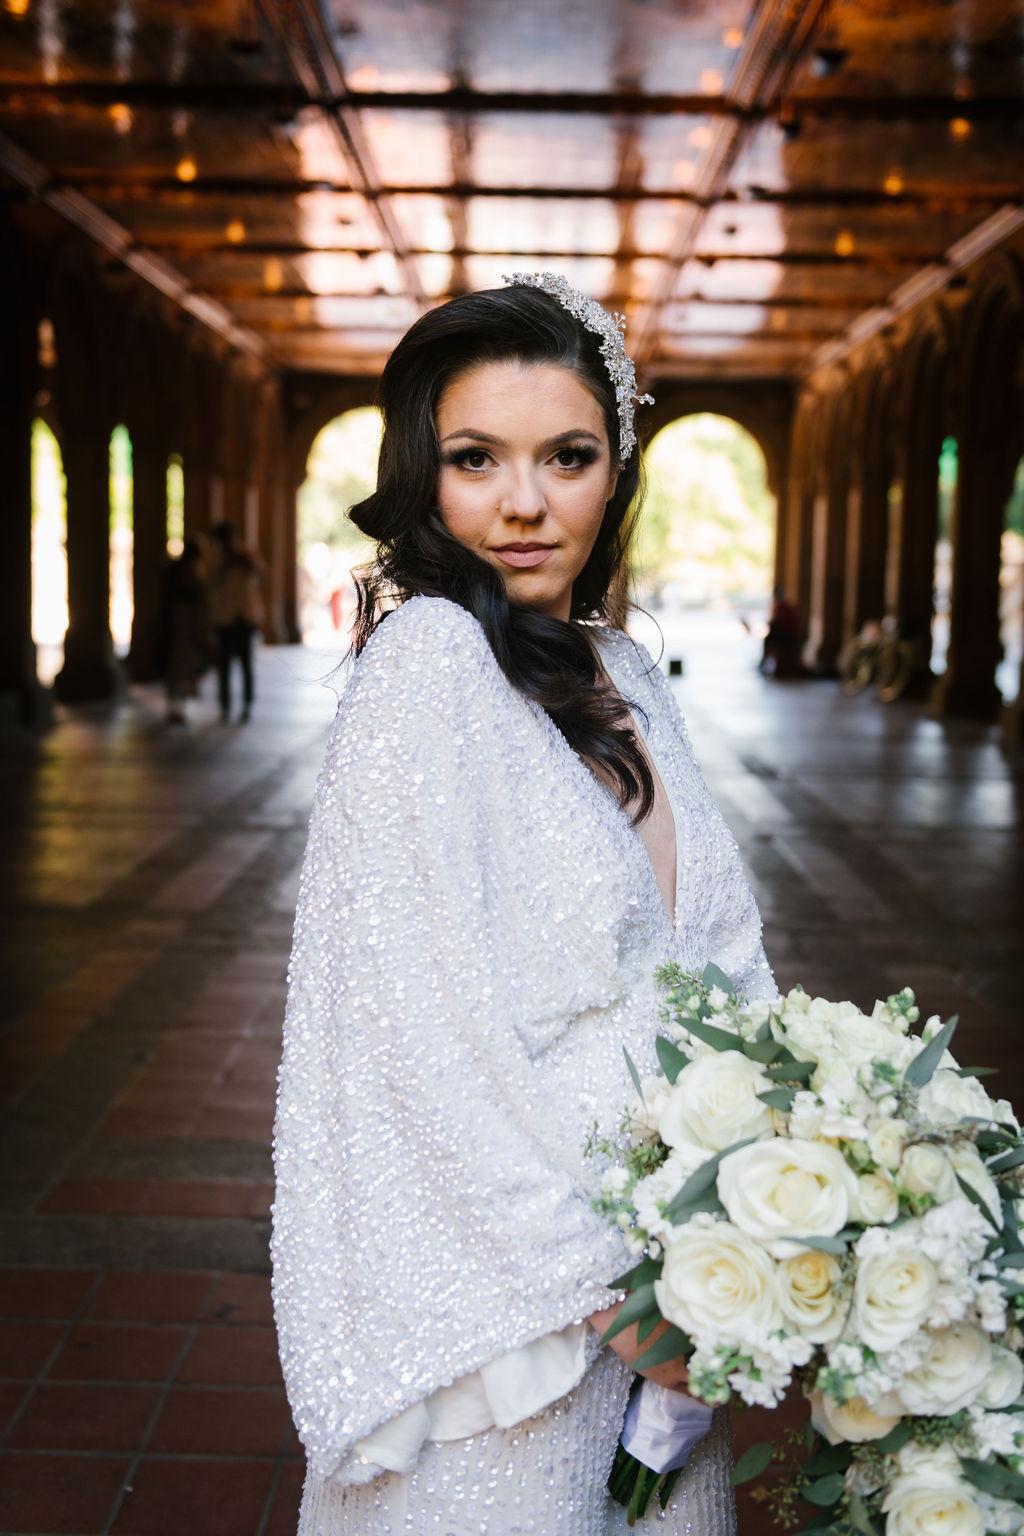 Central Park Micro Wedding-Everly Studios-06